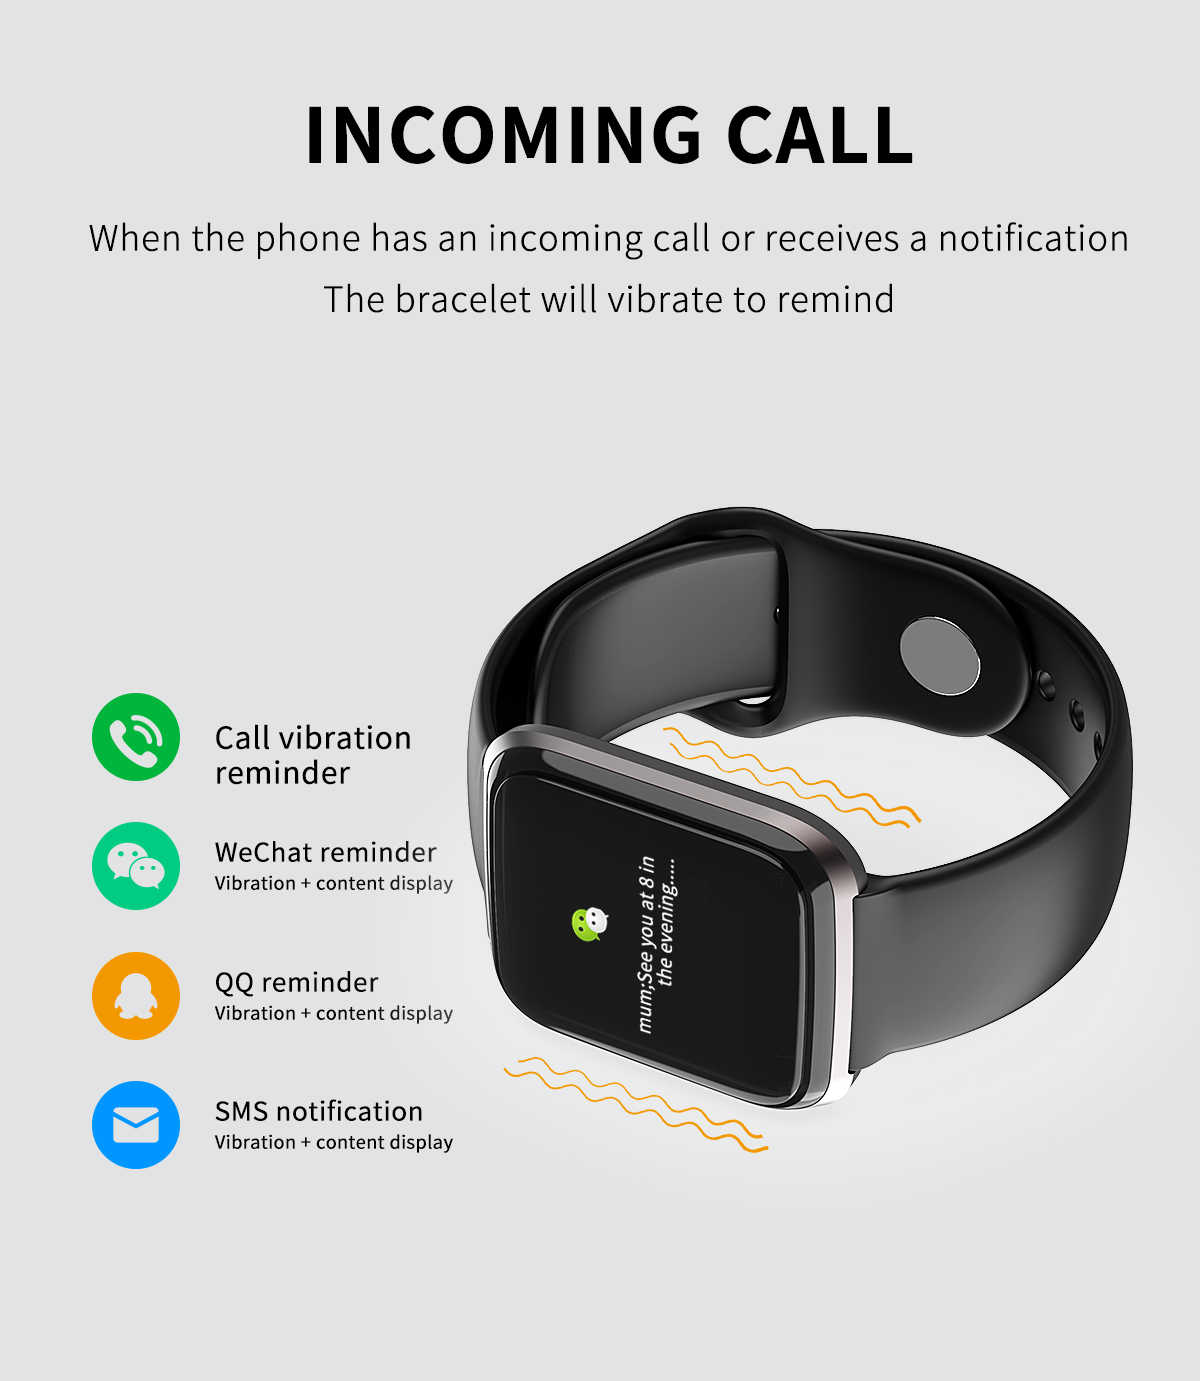 B57 Smartwatch Smartwatchs Smart Watch Orologio Smart Watchs Bluetooth B57 Waterproof Kospet Hope 4g Bokep Indonesia Smart Watches Aliexpress